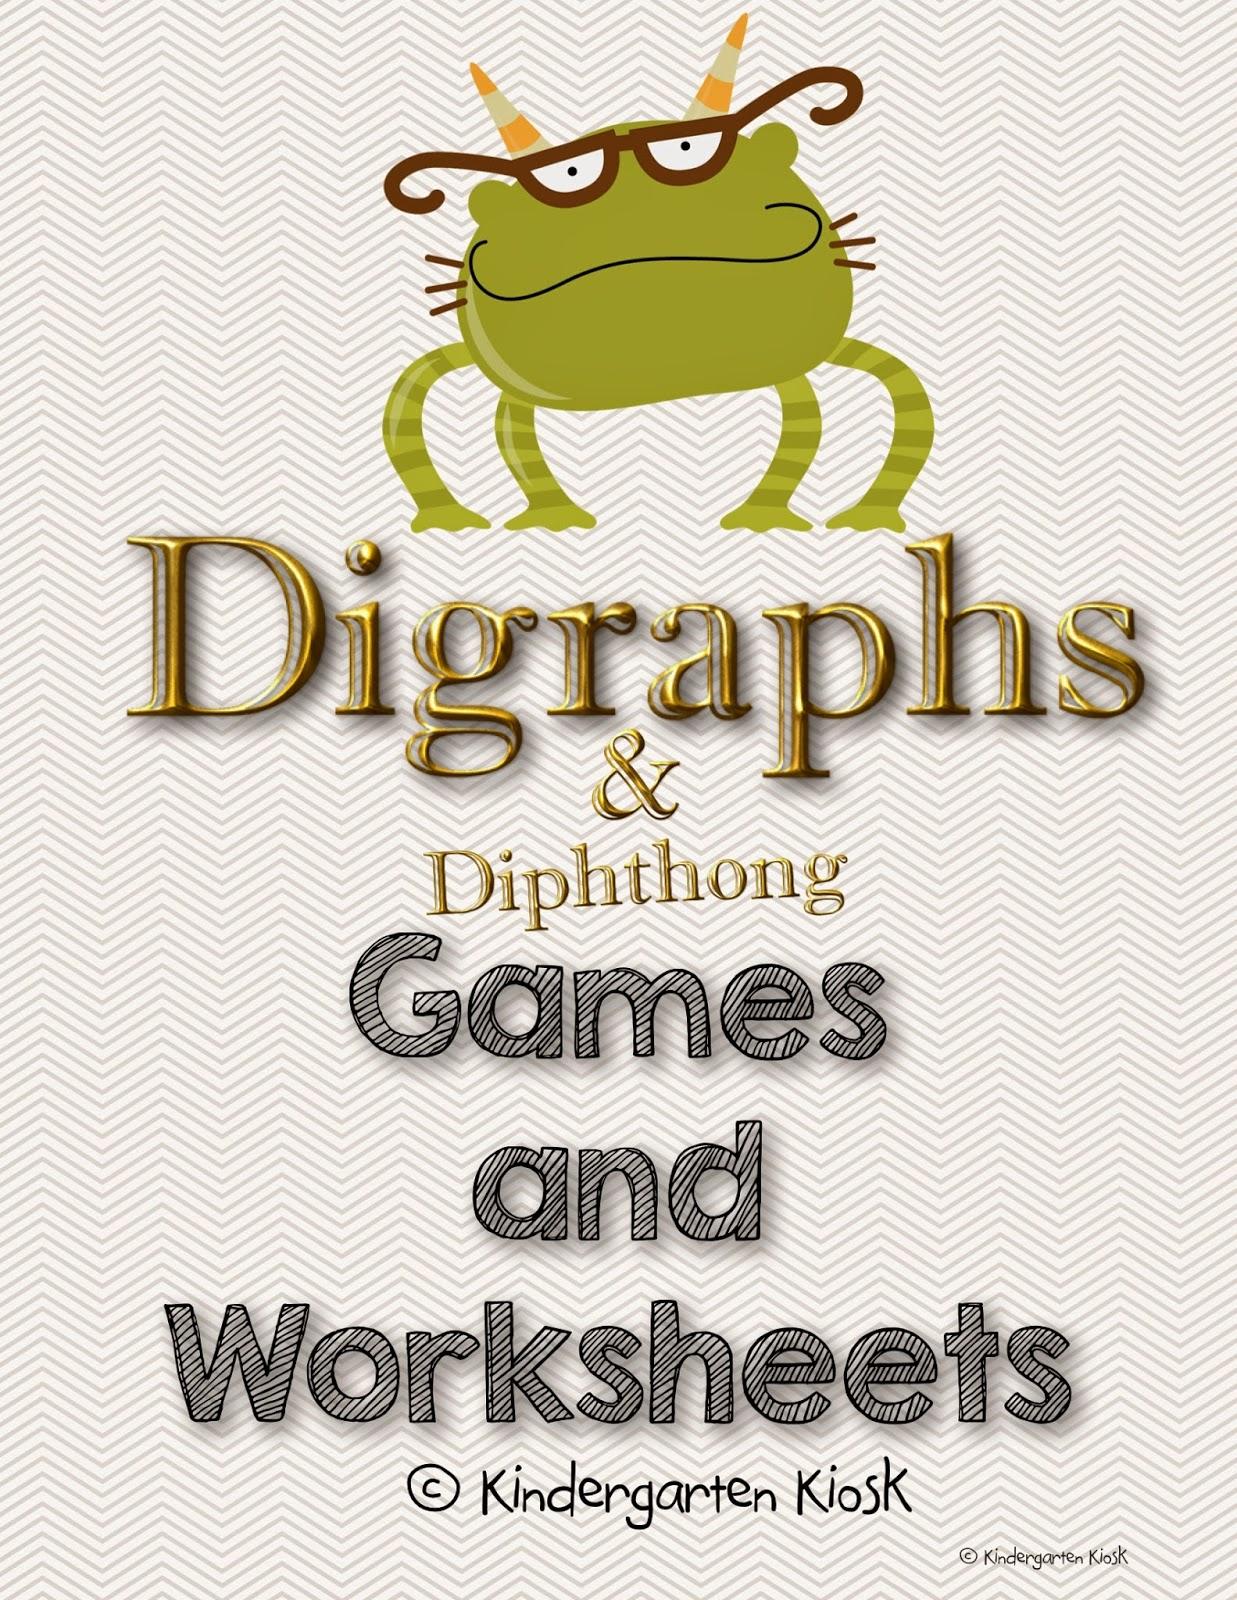 Kindergarten Kiosk Digraphs And Diphthongs